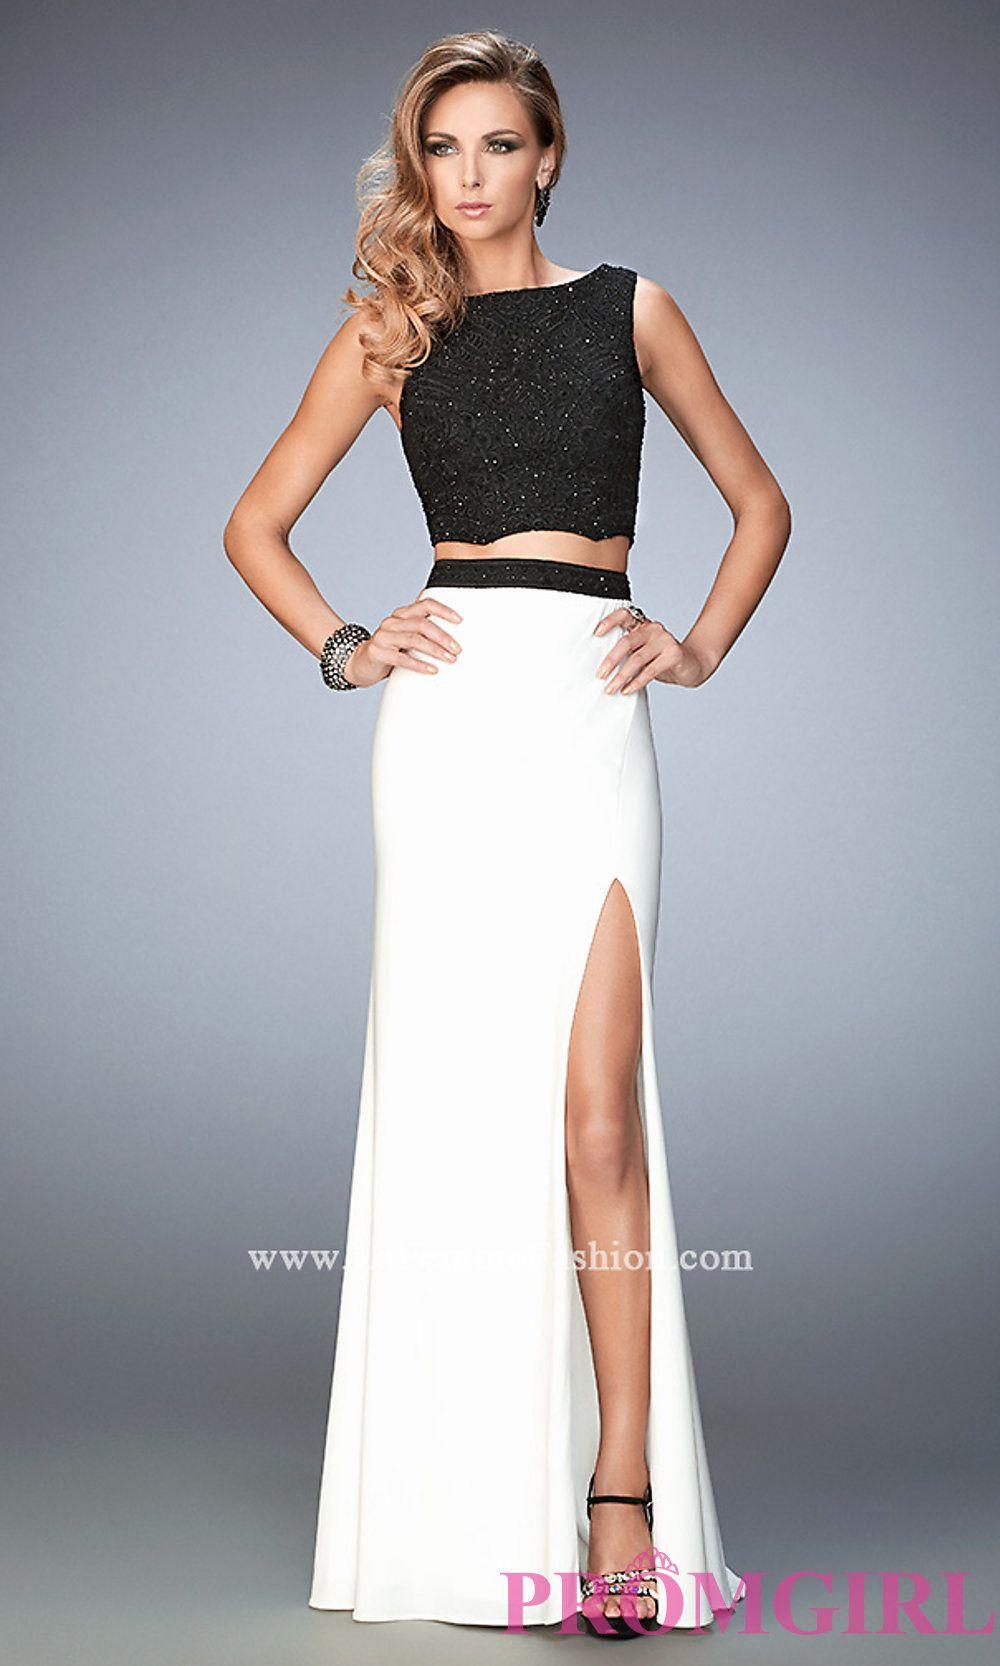 Black Top White Long Jersey Skirt Prom Dress by Gigi Style: LF-22578 ...